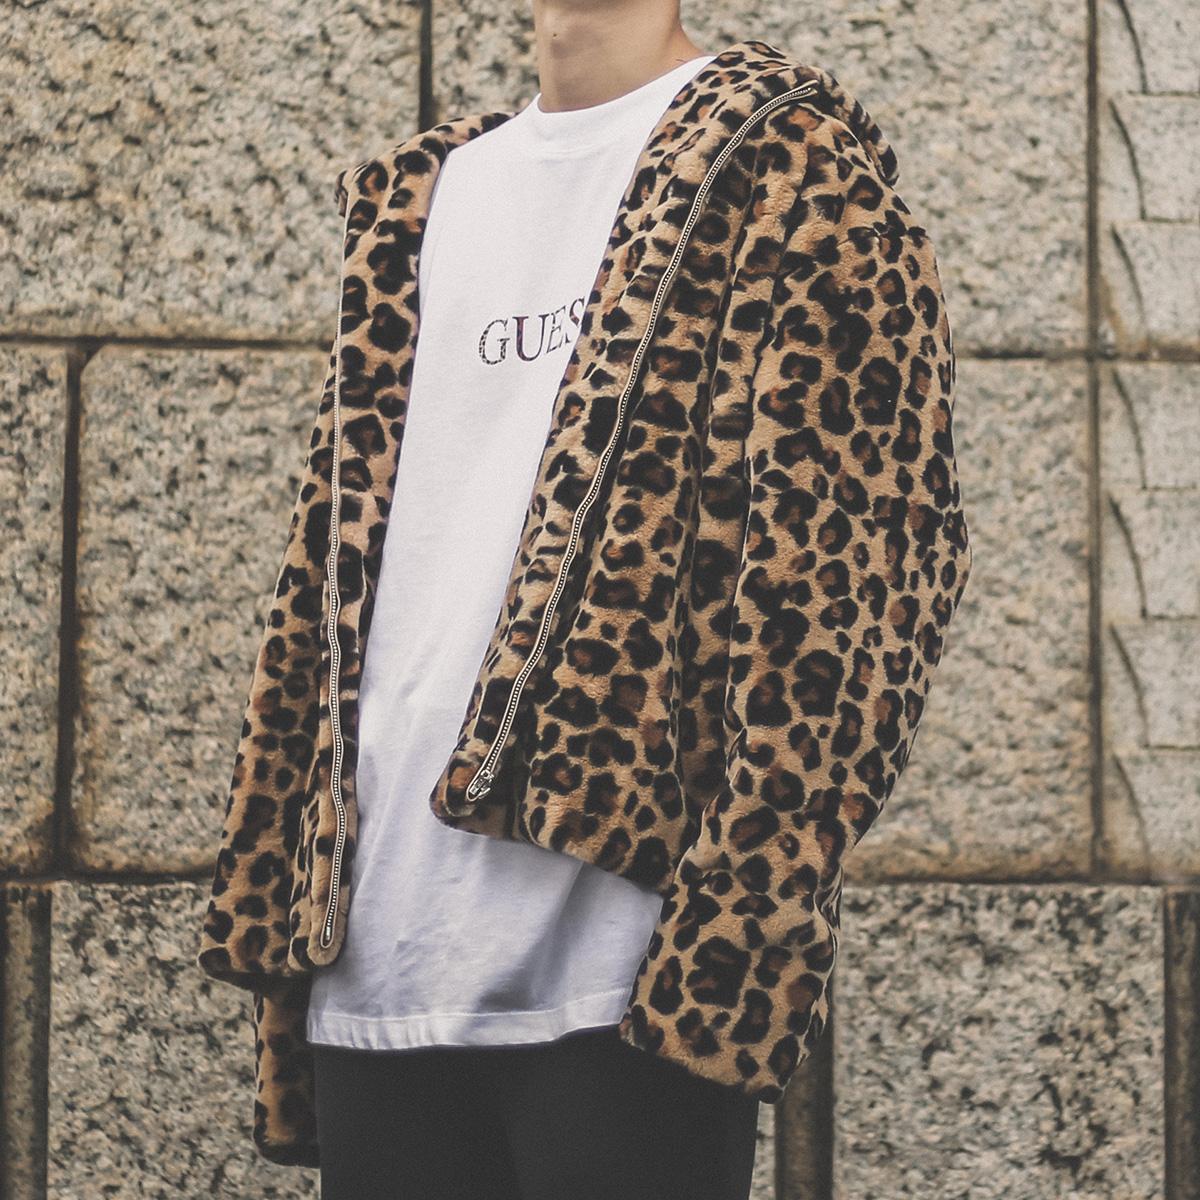 GUESS Fake Fur Jacket (ゲス フェイク ファー ジャケット)LEO【メンズ レディース ジャケット】18HO-S